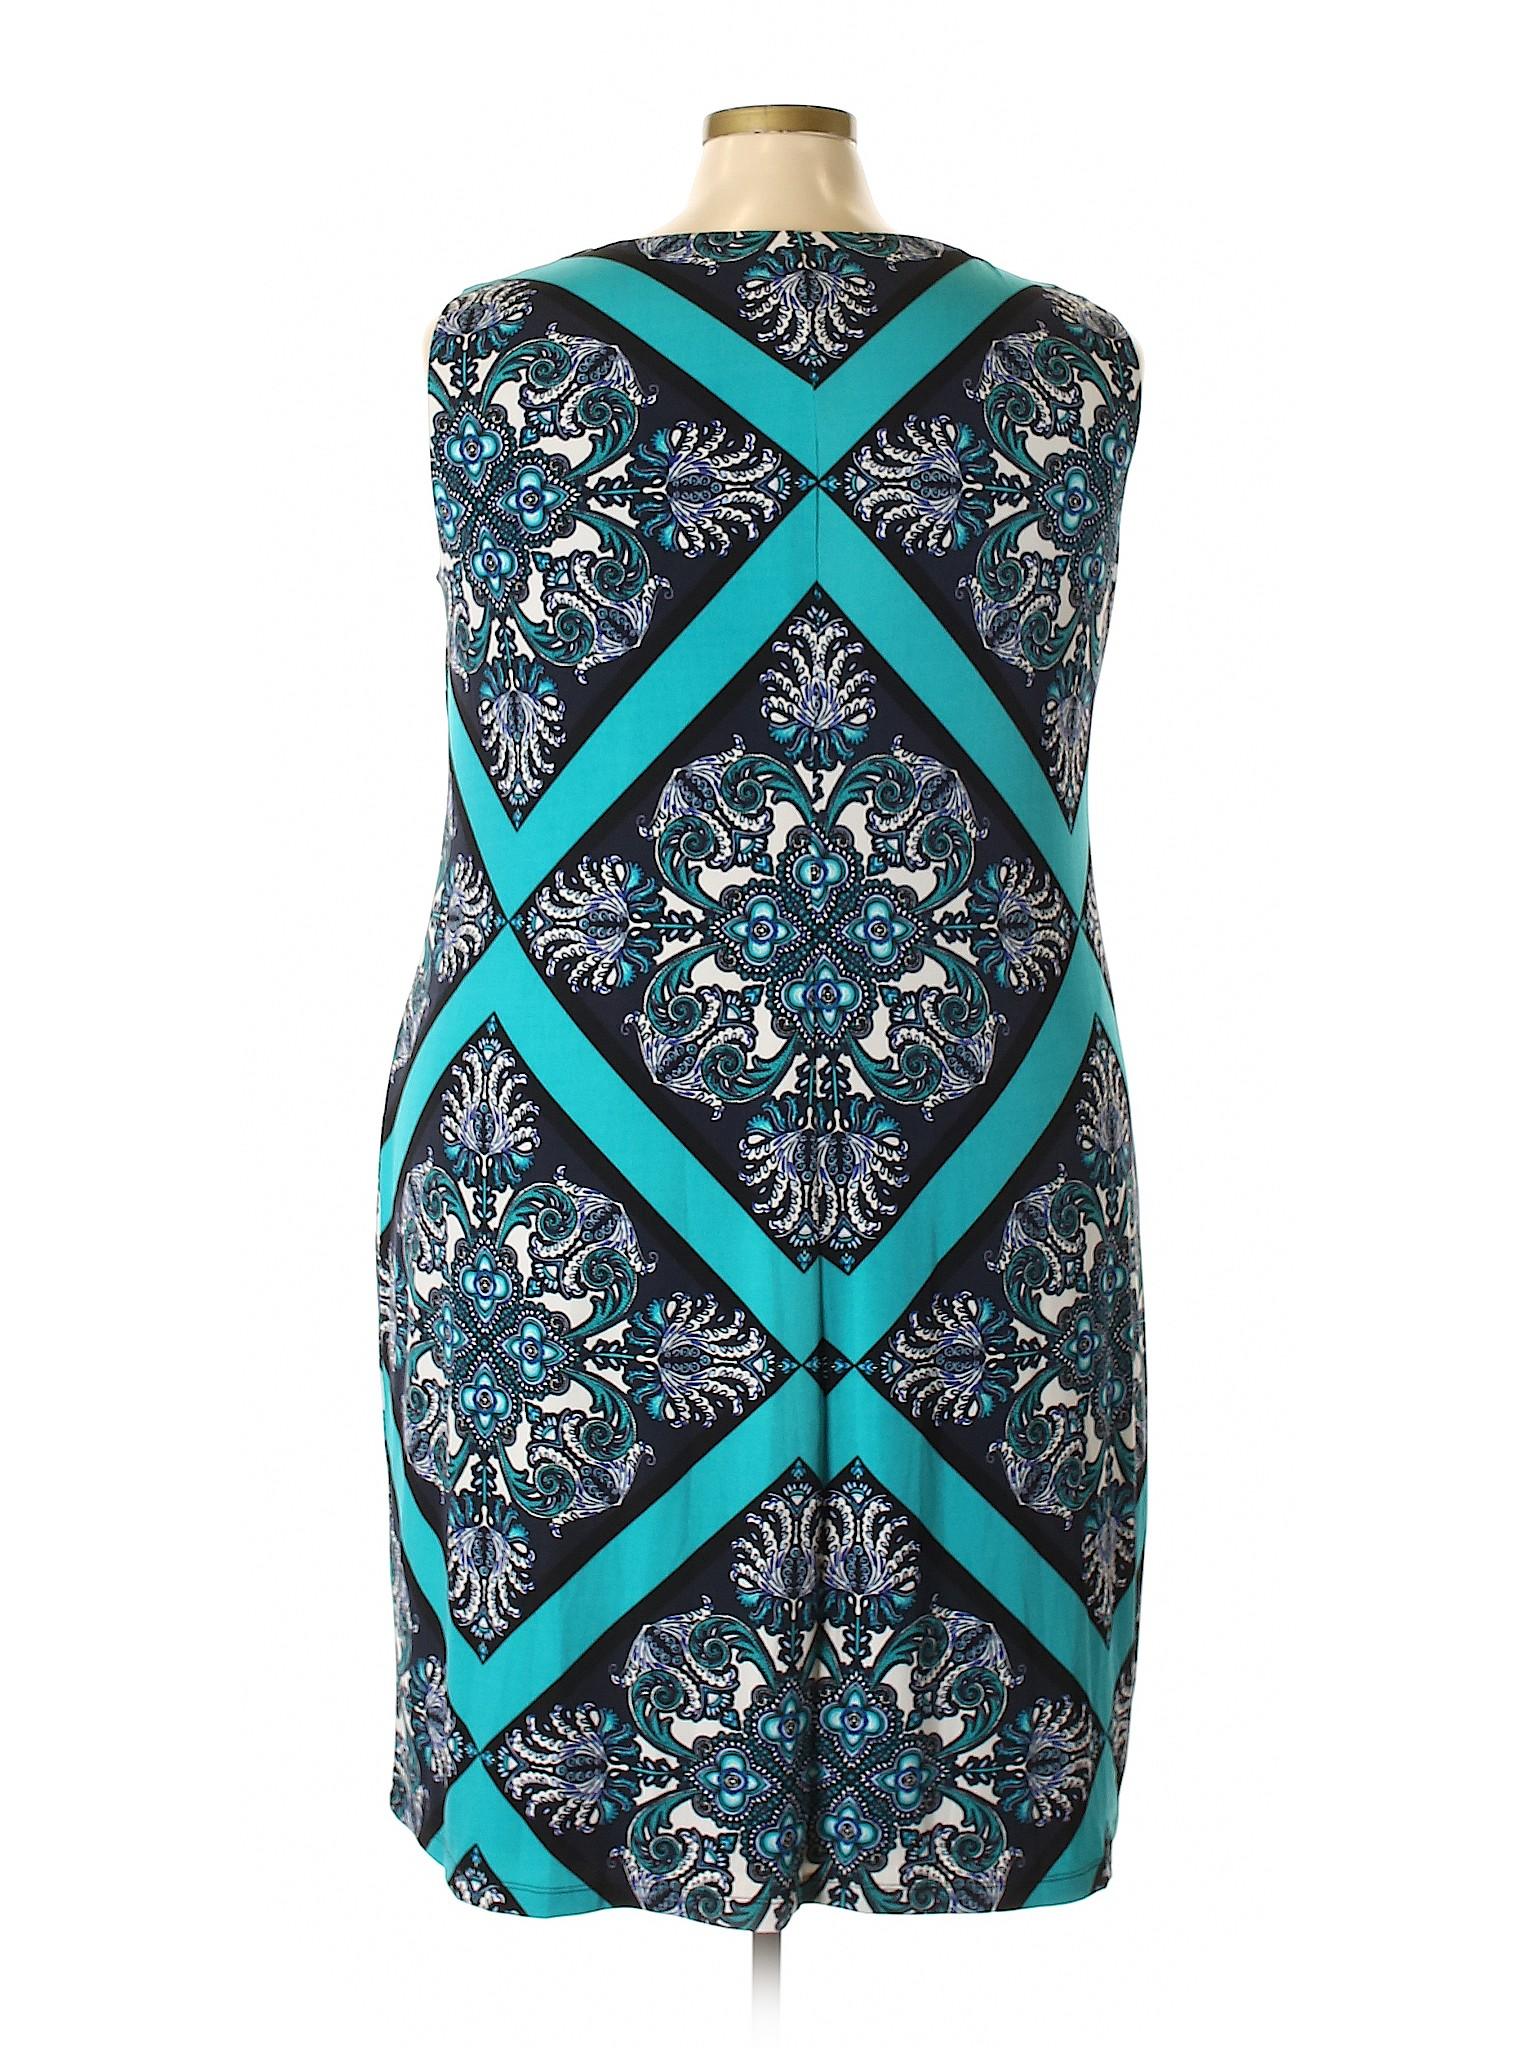 Dress Casual Boutique International winter INC Concepts gav46